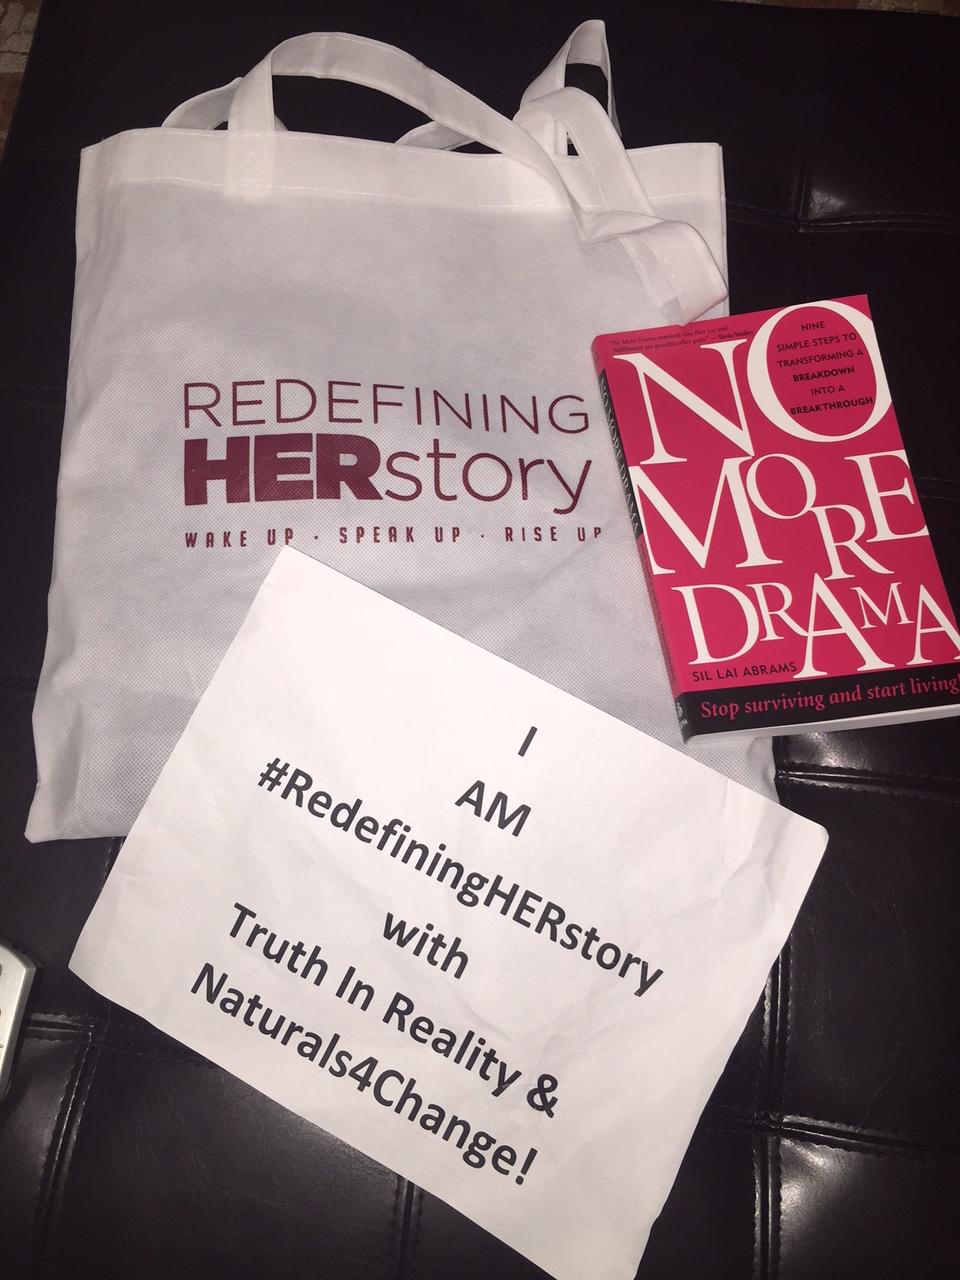 Redefining HERstory